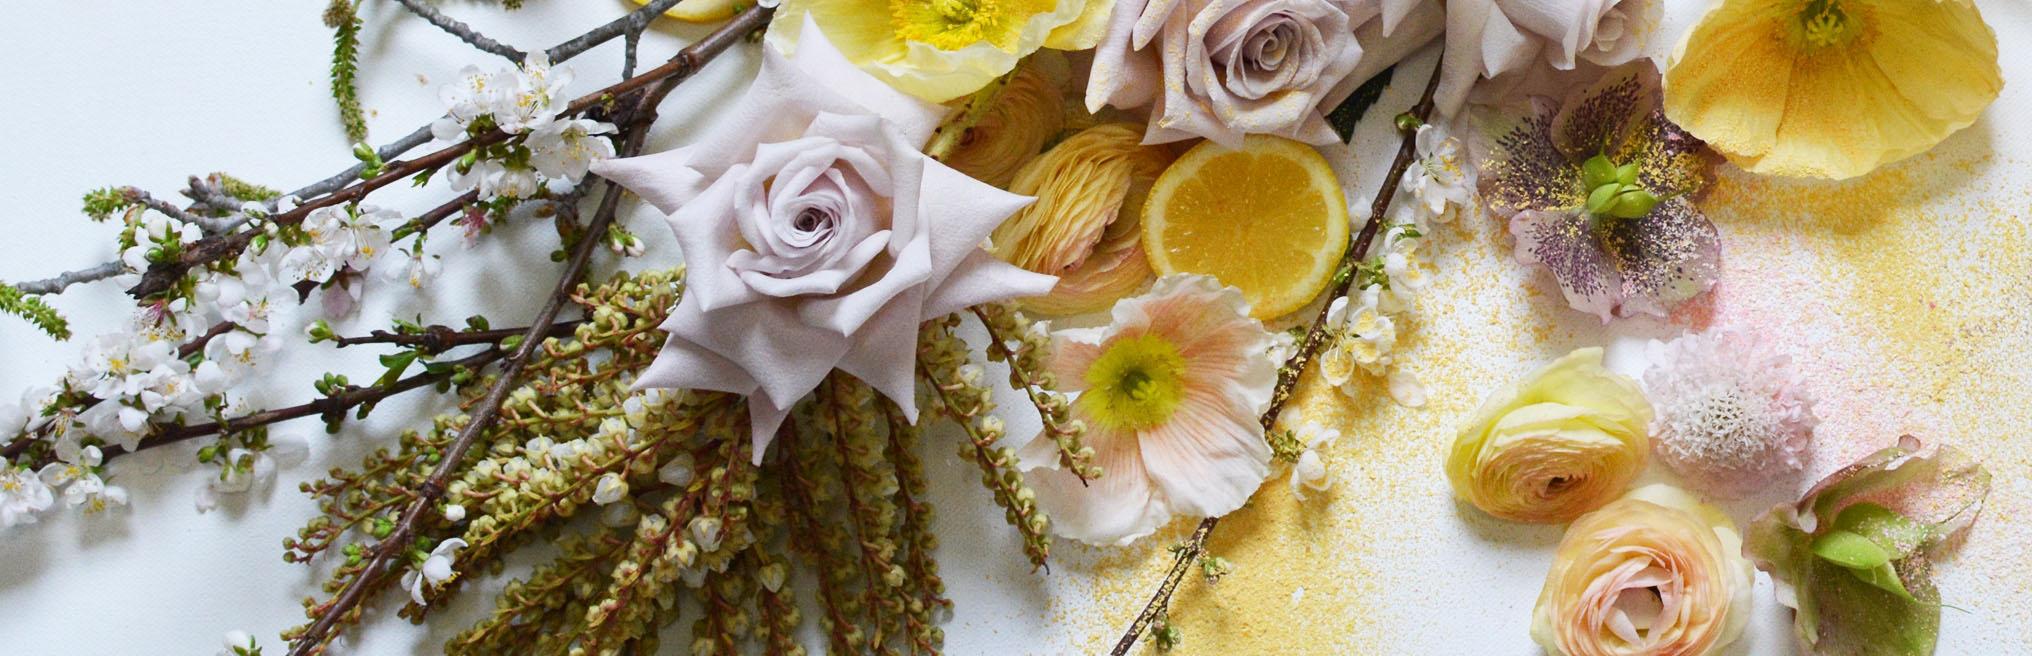 Wedding & Events Flower Ideas